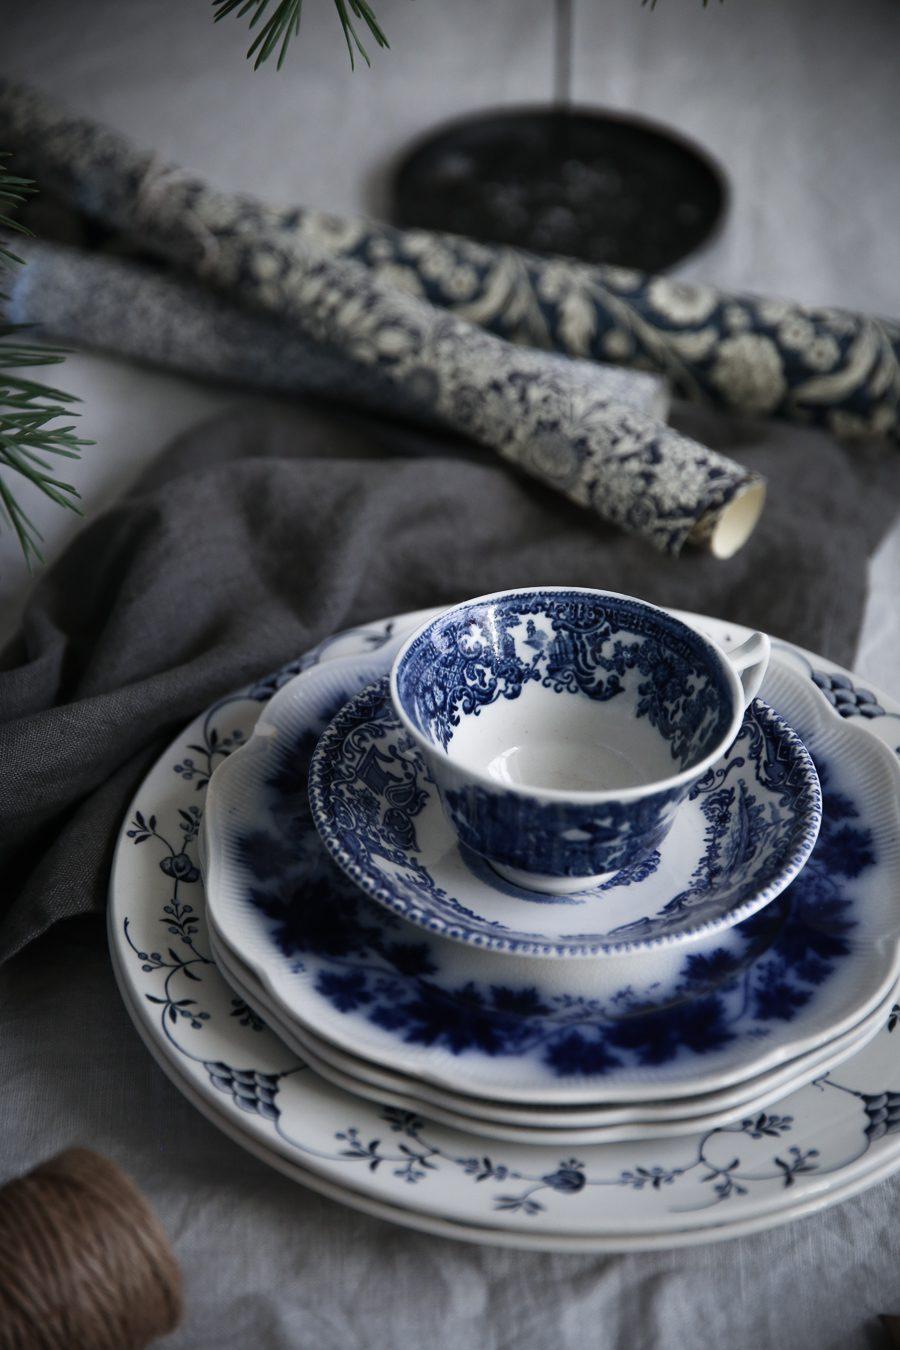 viktoria.holmgren.lovely.life.svenska.slott.vinranka